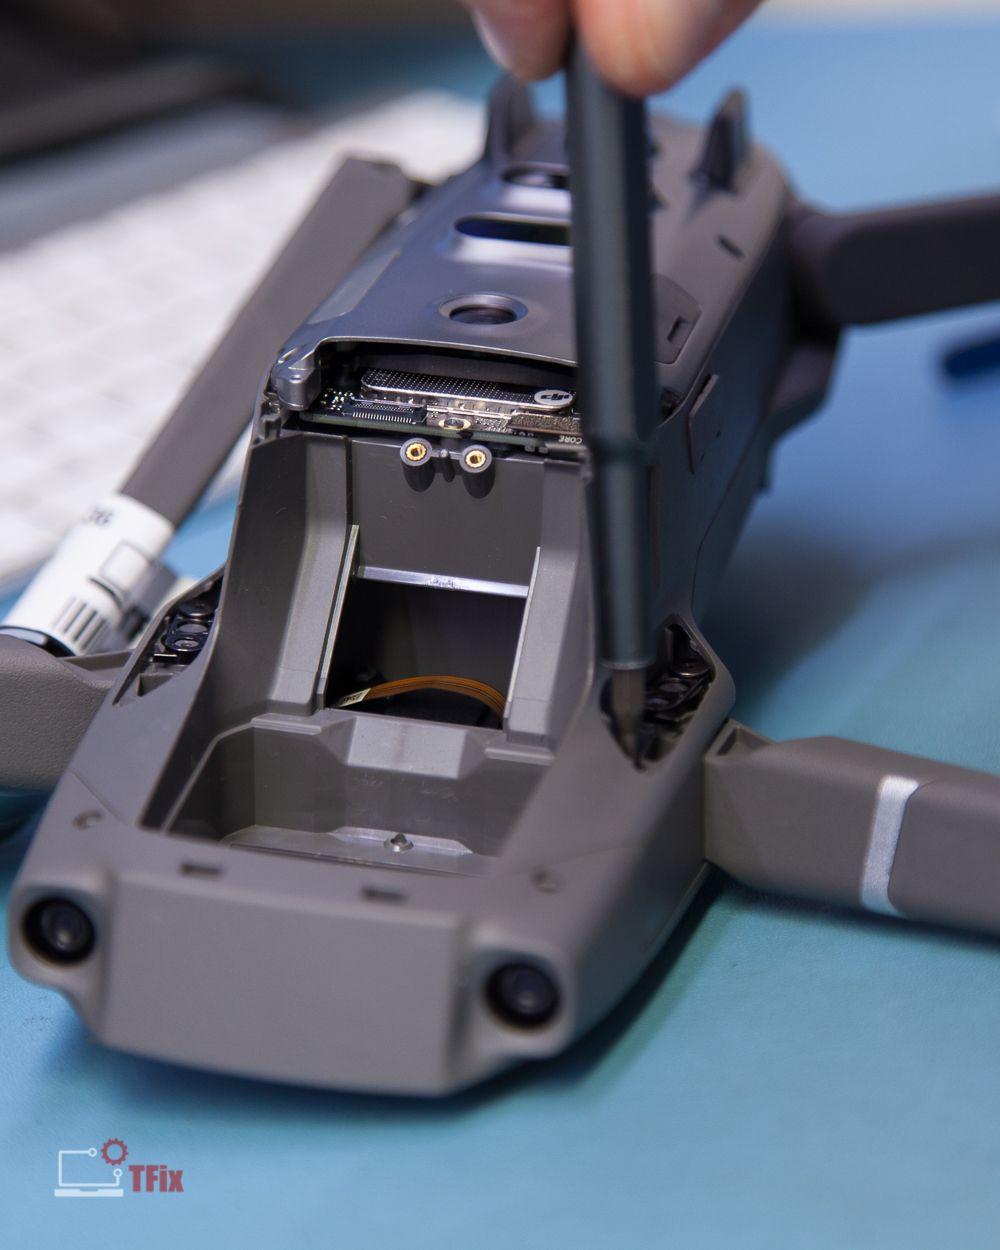 Dji mavic 2 gimbal camera replacement drone dji